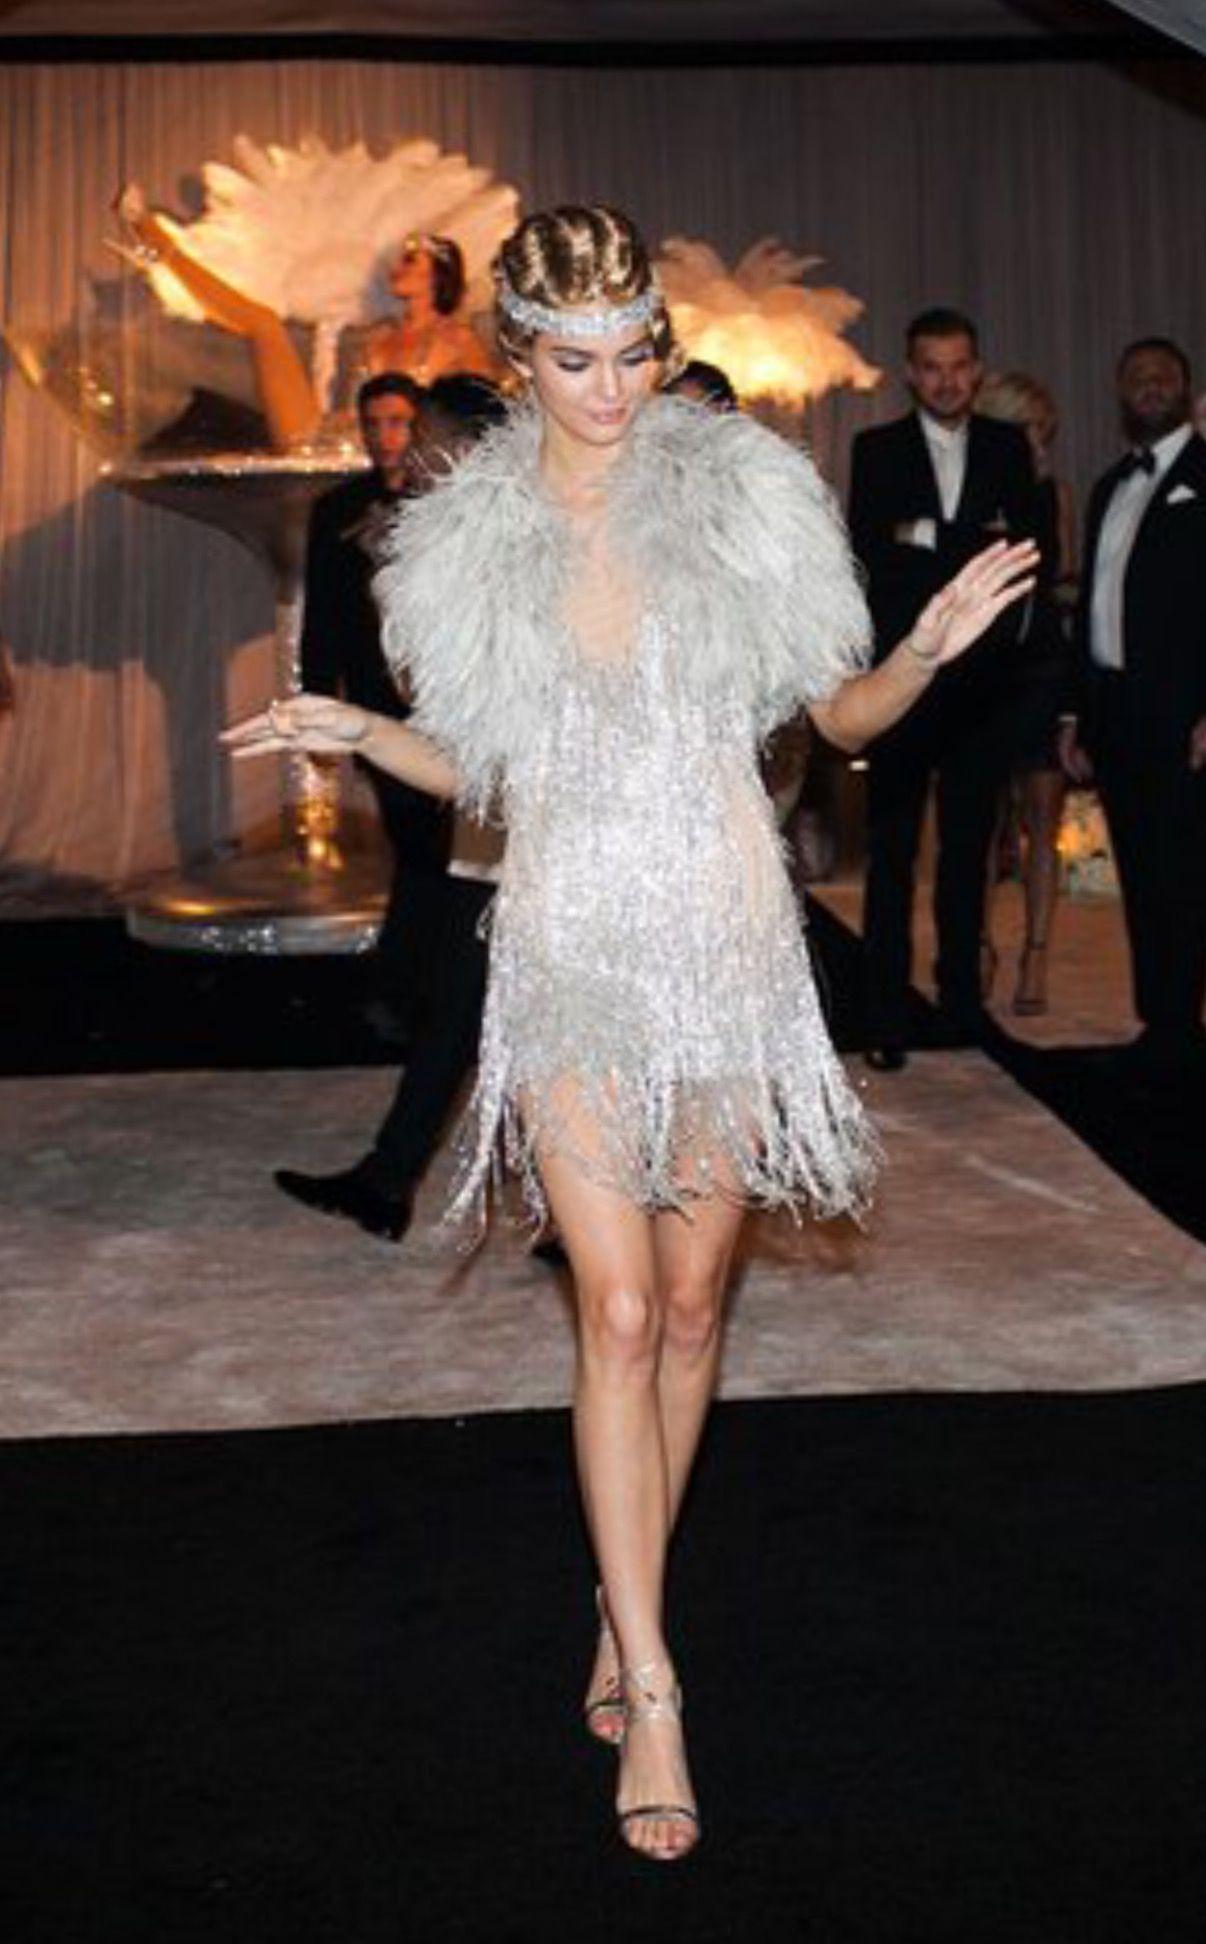 Reception Dress Only The Bottom I Like Gatsby Party Outfit Great Gatsby Dresses Gatsby Party Dress